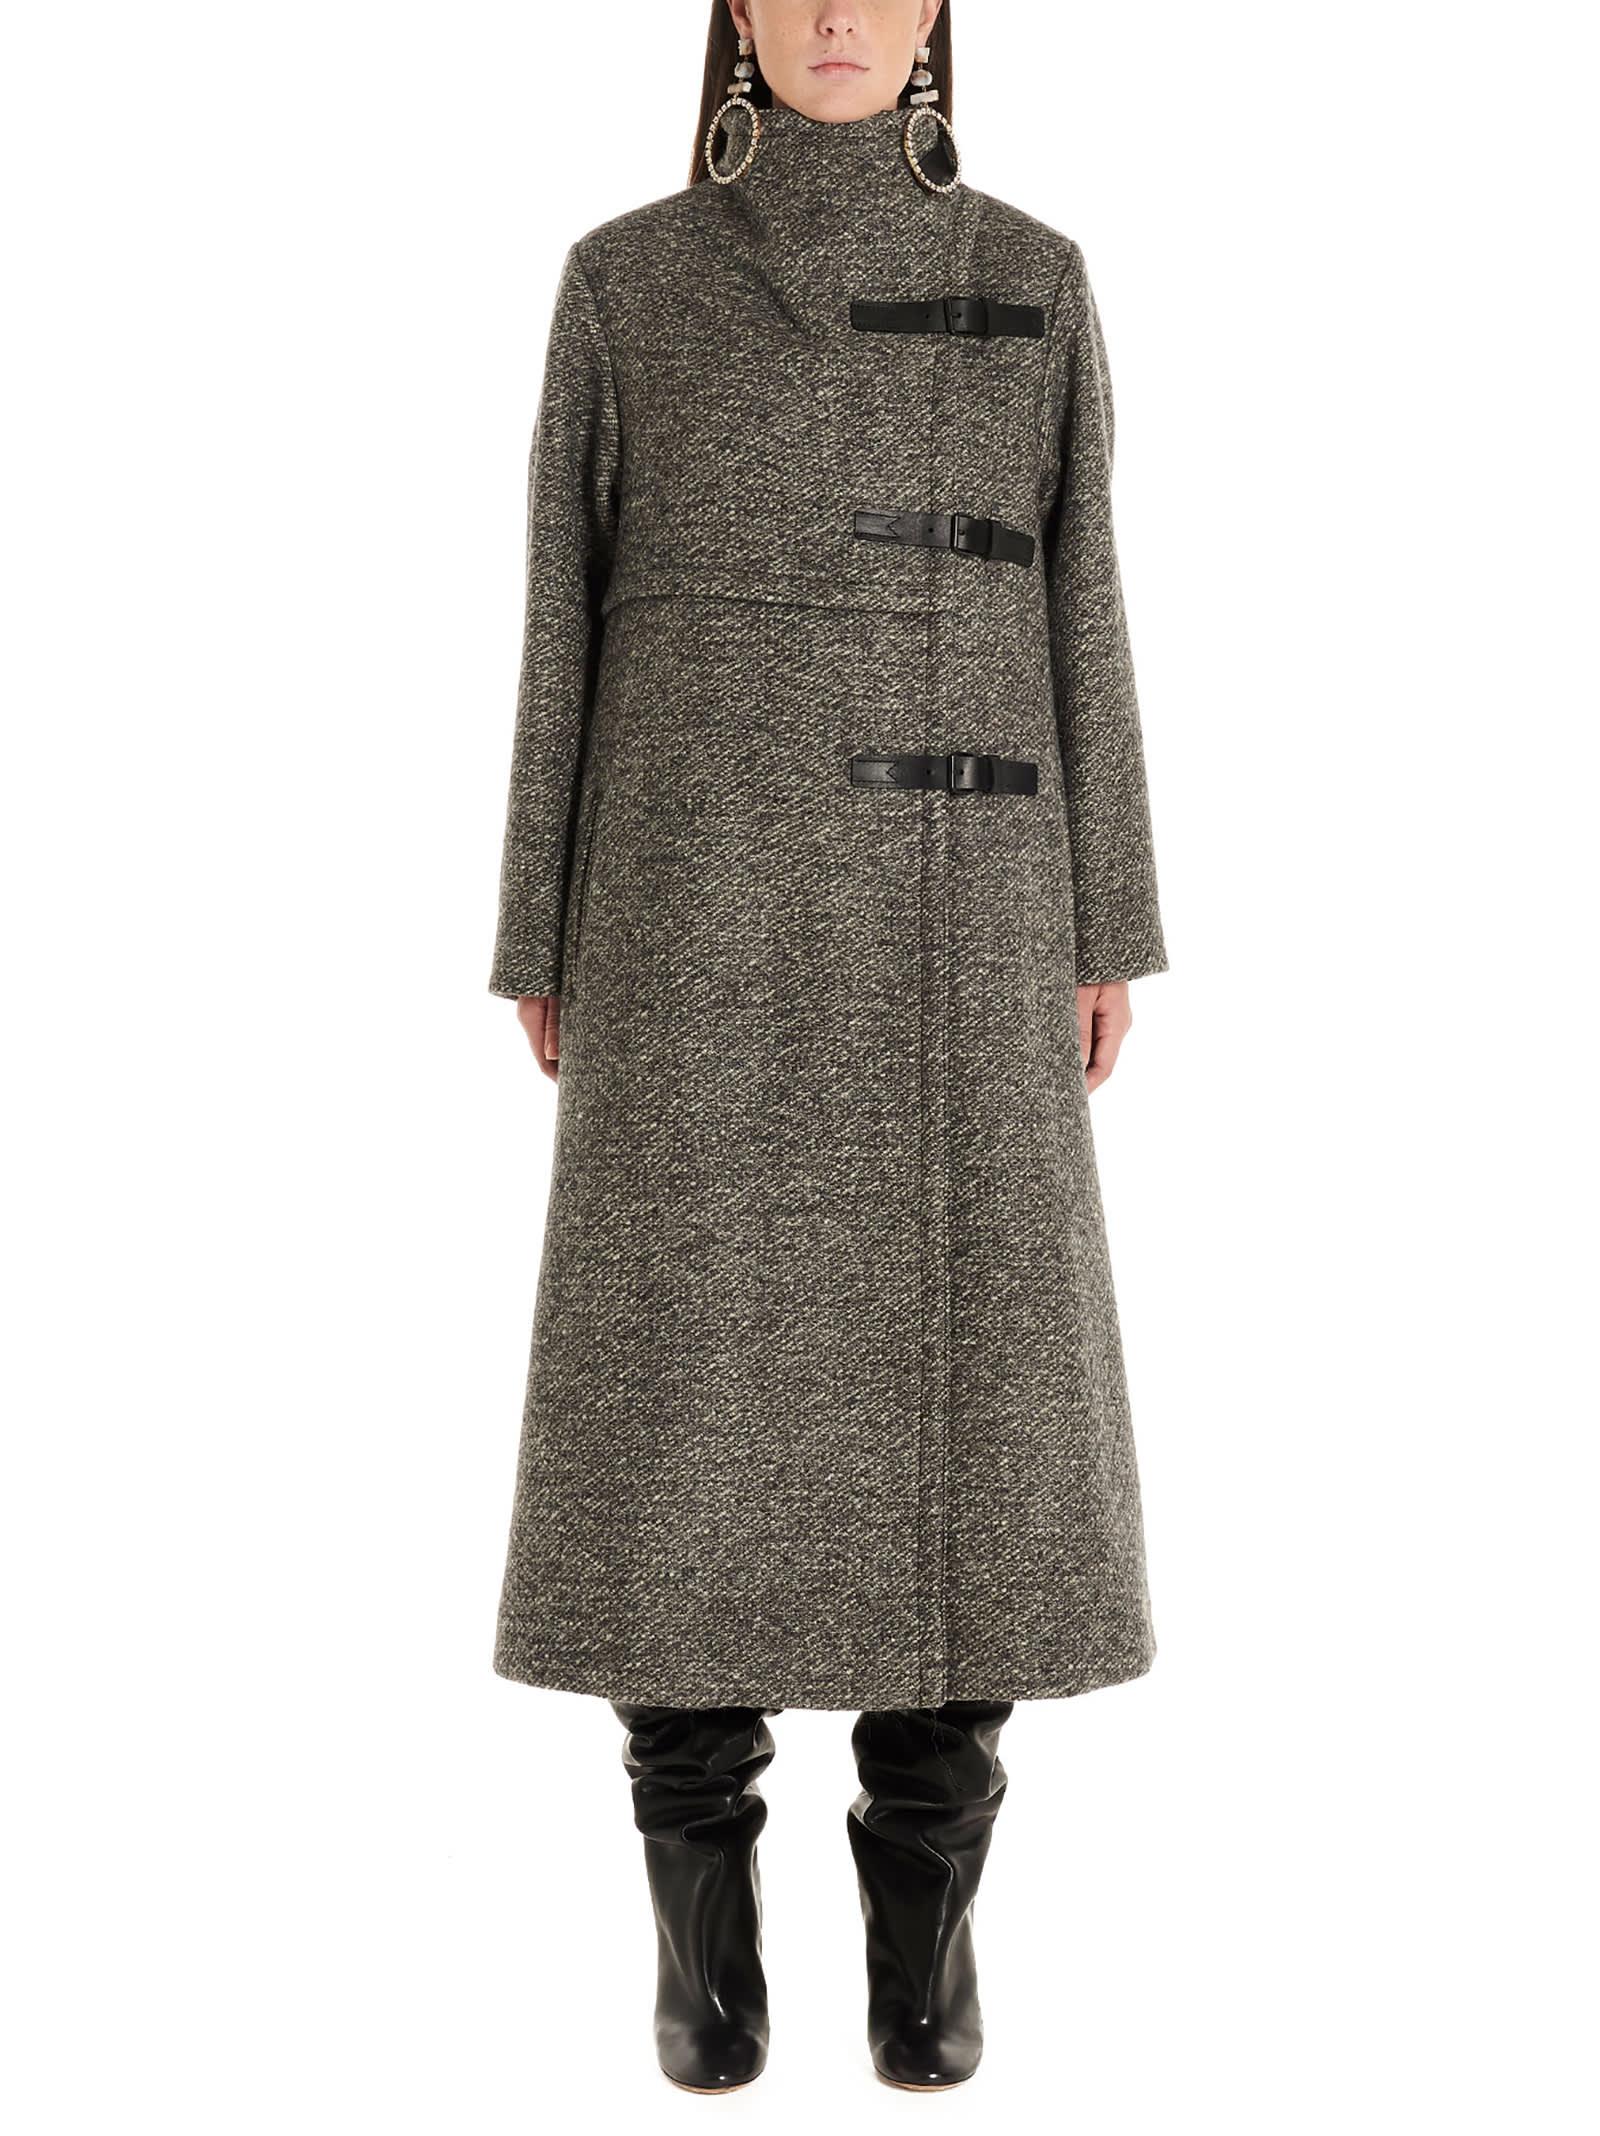 Photo of  Isabel Marant natacha Coat- shop Isabel Marant jackets online sales